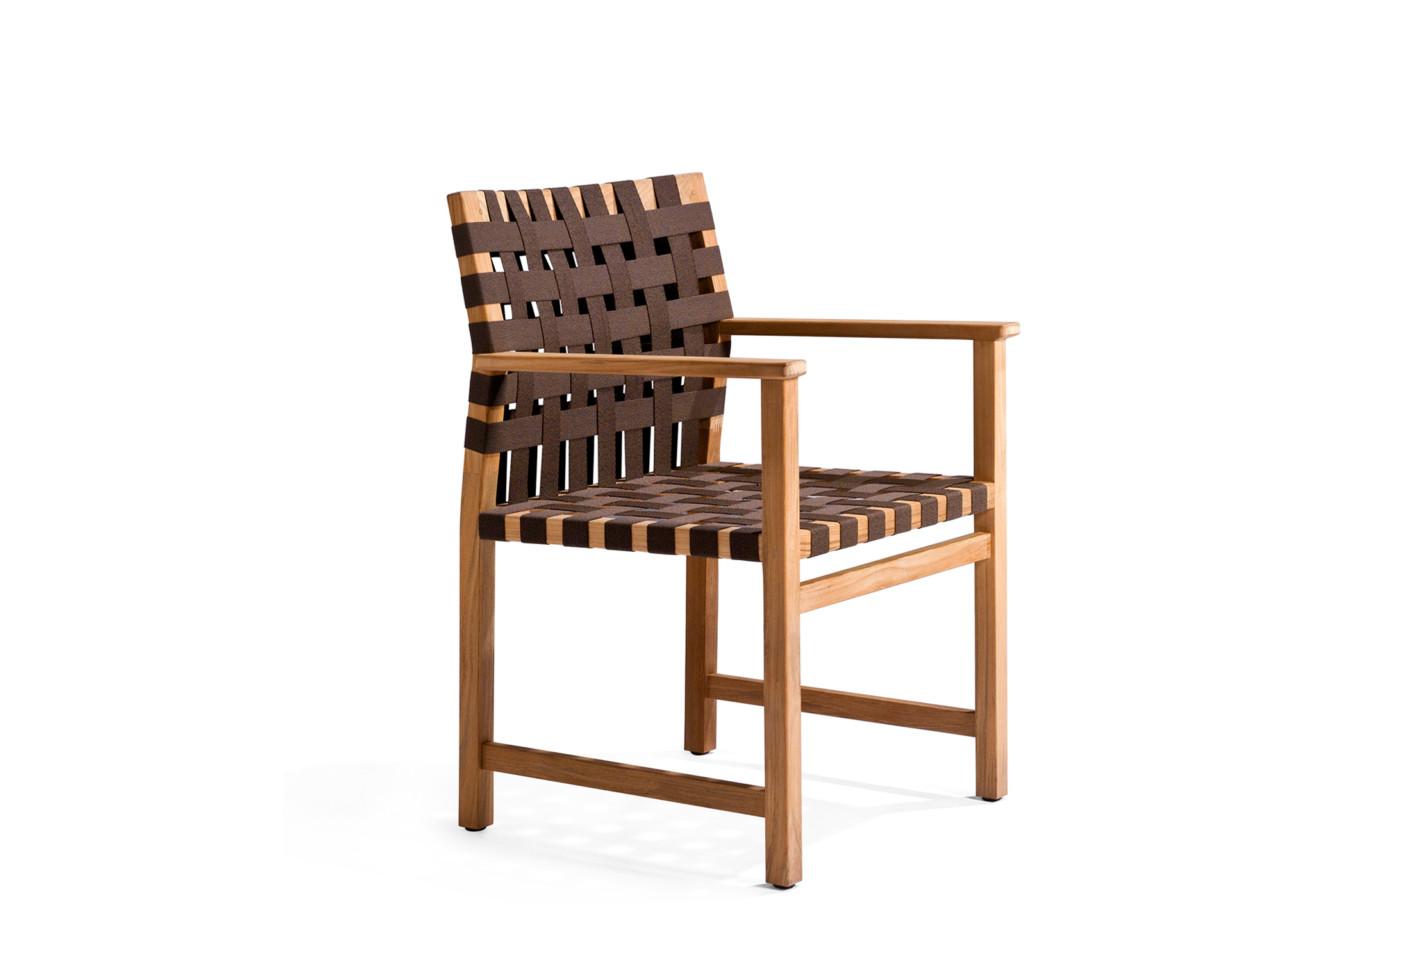 vis vis chair by trib stylepark. Black Bedroom Furniture Sets. Home Design Ideas